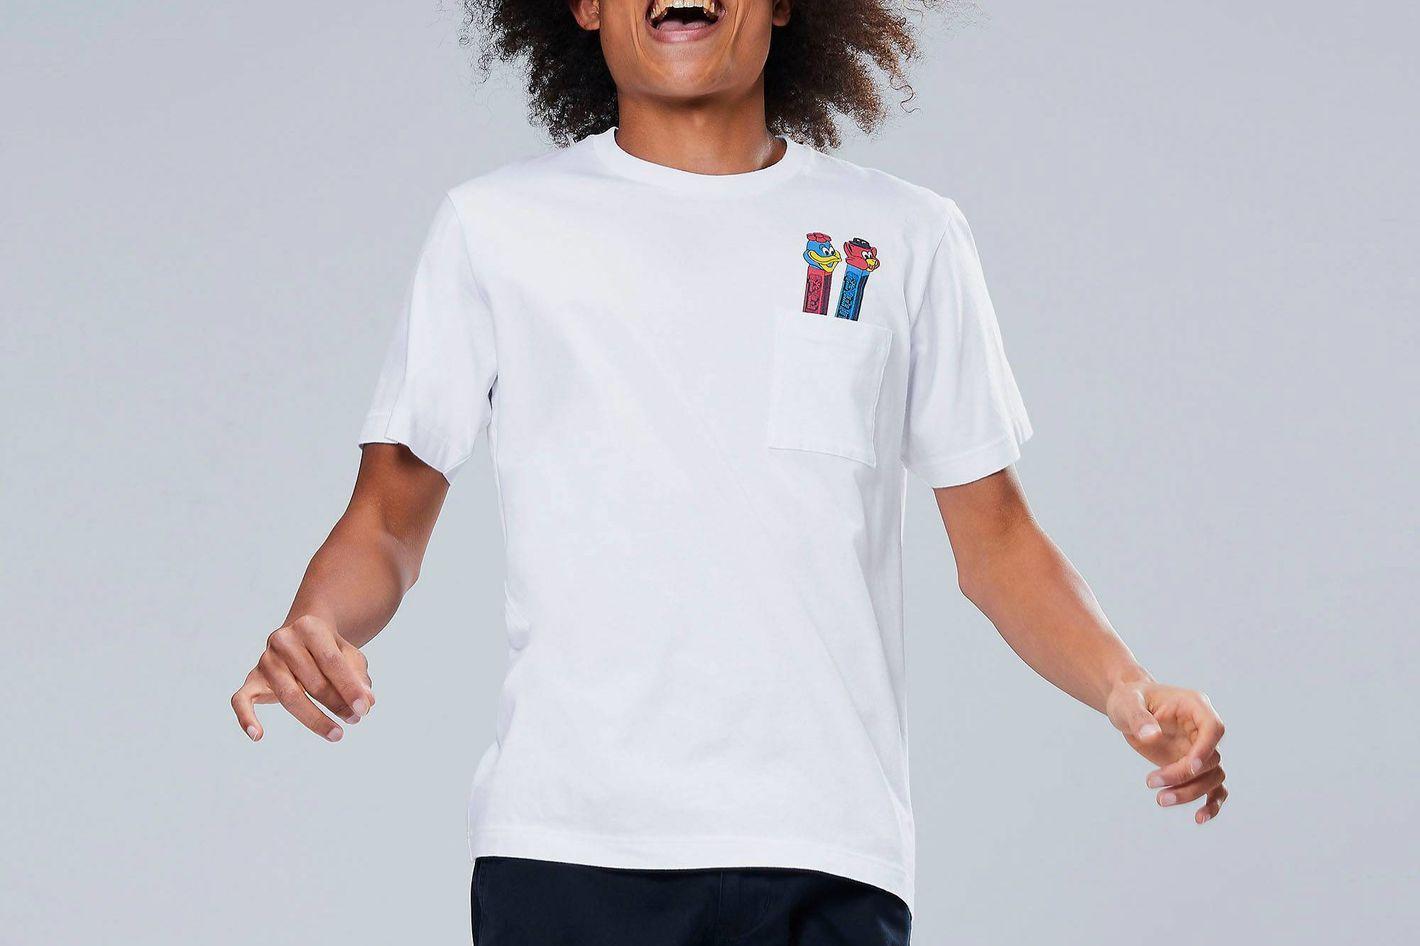 Uniqlo Brands Masterpiece Pez T-Shirt